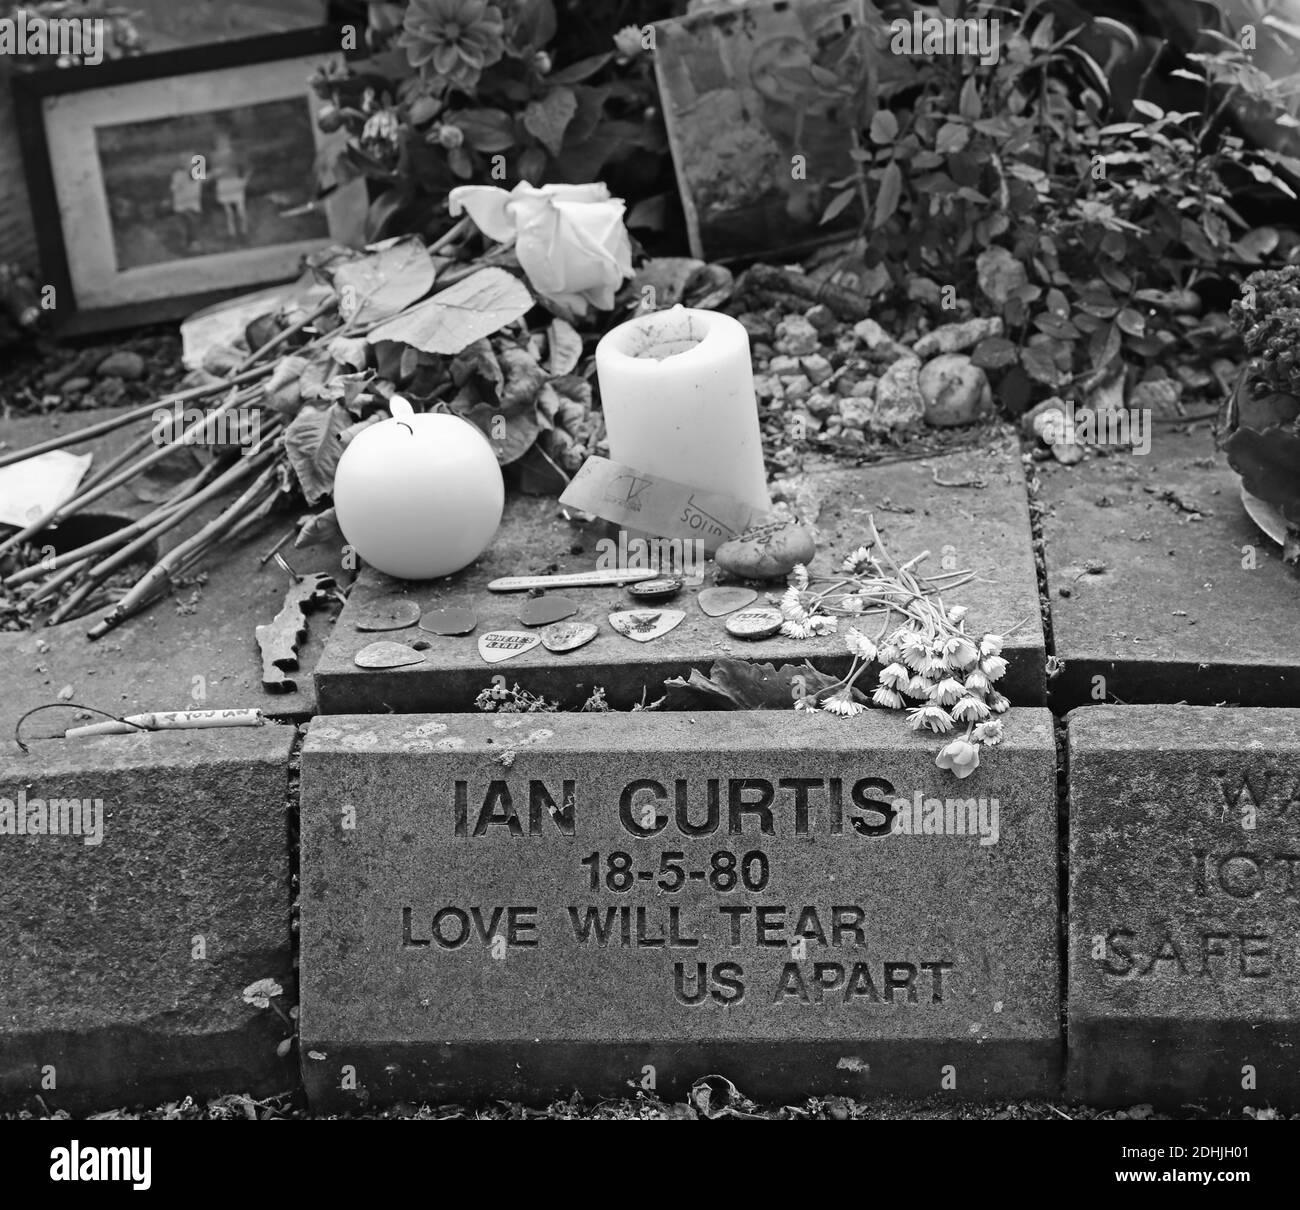 Ian Curtis memorial stone at  Macclesfield Crematorium,Prestbury Road,Cheshire,England,UK,SK10,Factory label,Joy Division vocalist,song writer Stock Photo